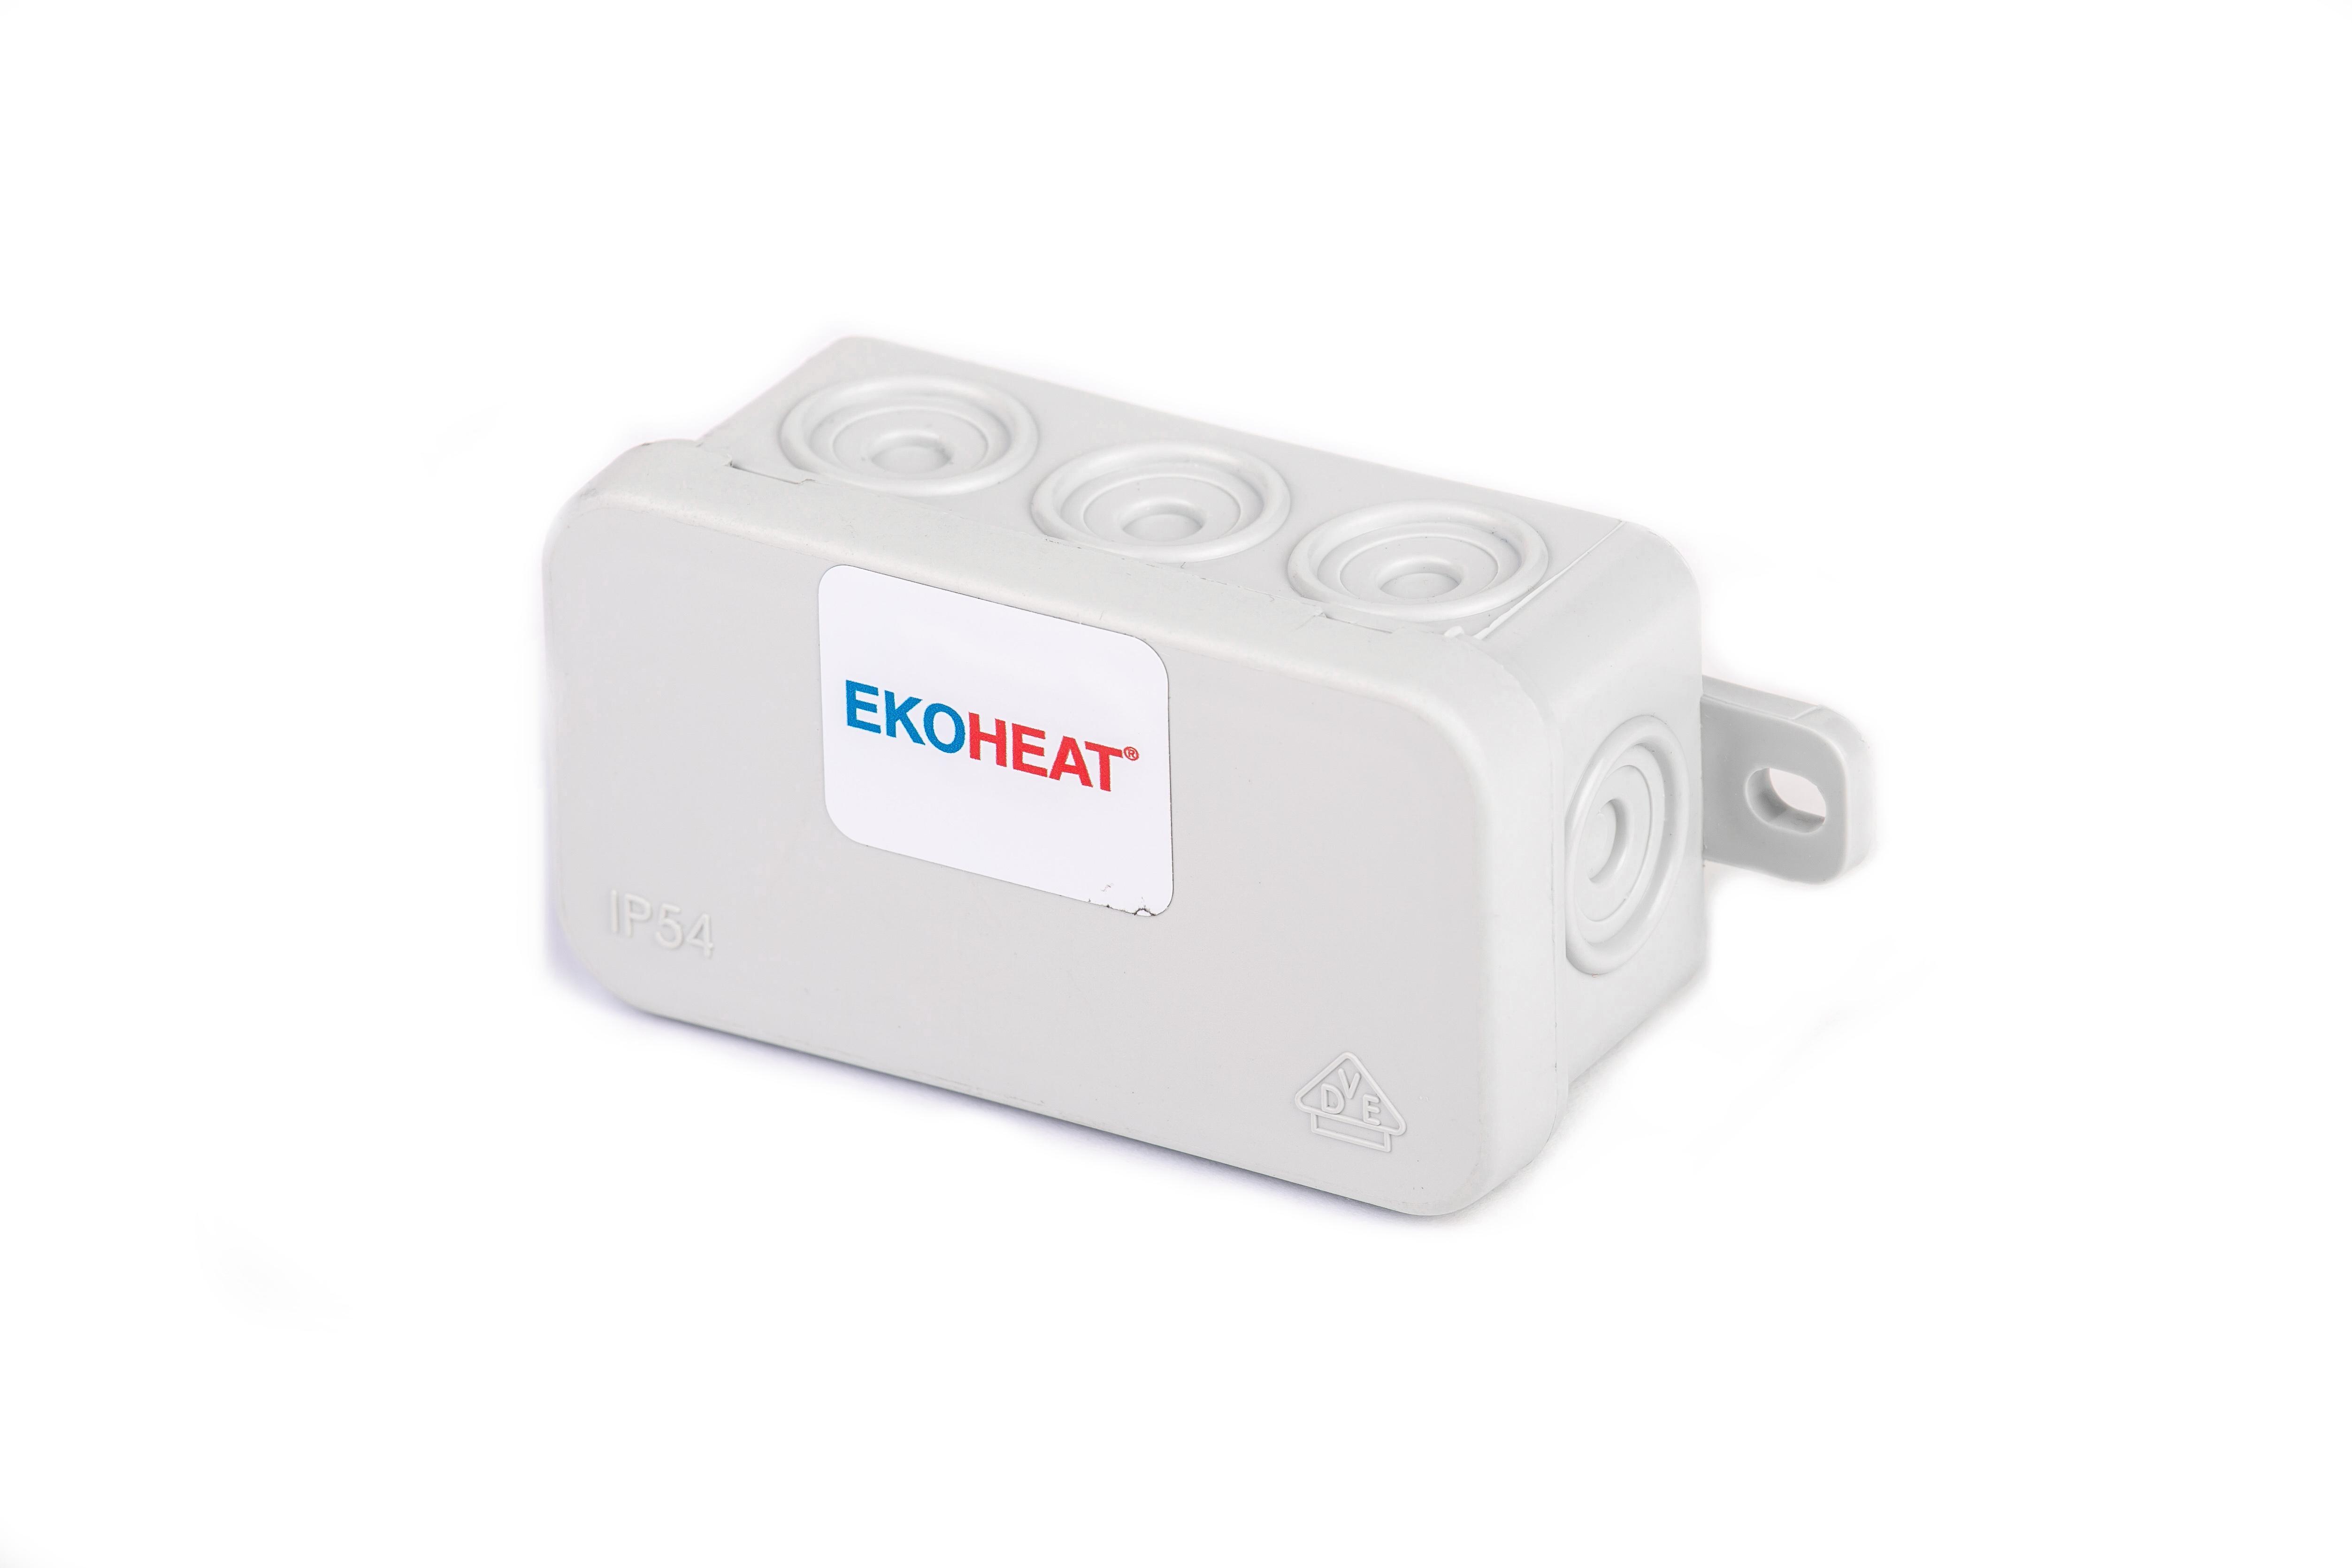 Prostorový teplotní senzor EKOHEAT SEN-IP54